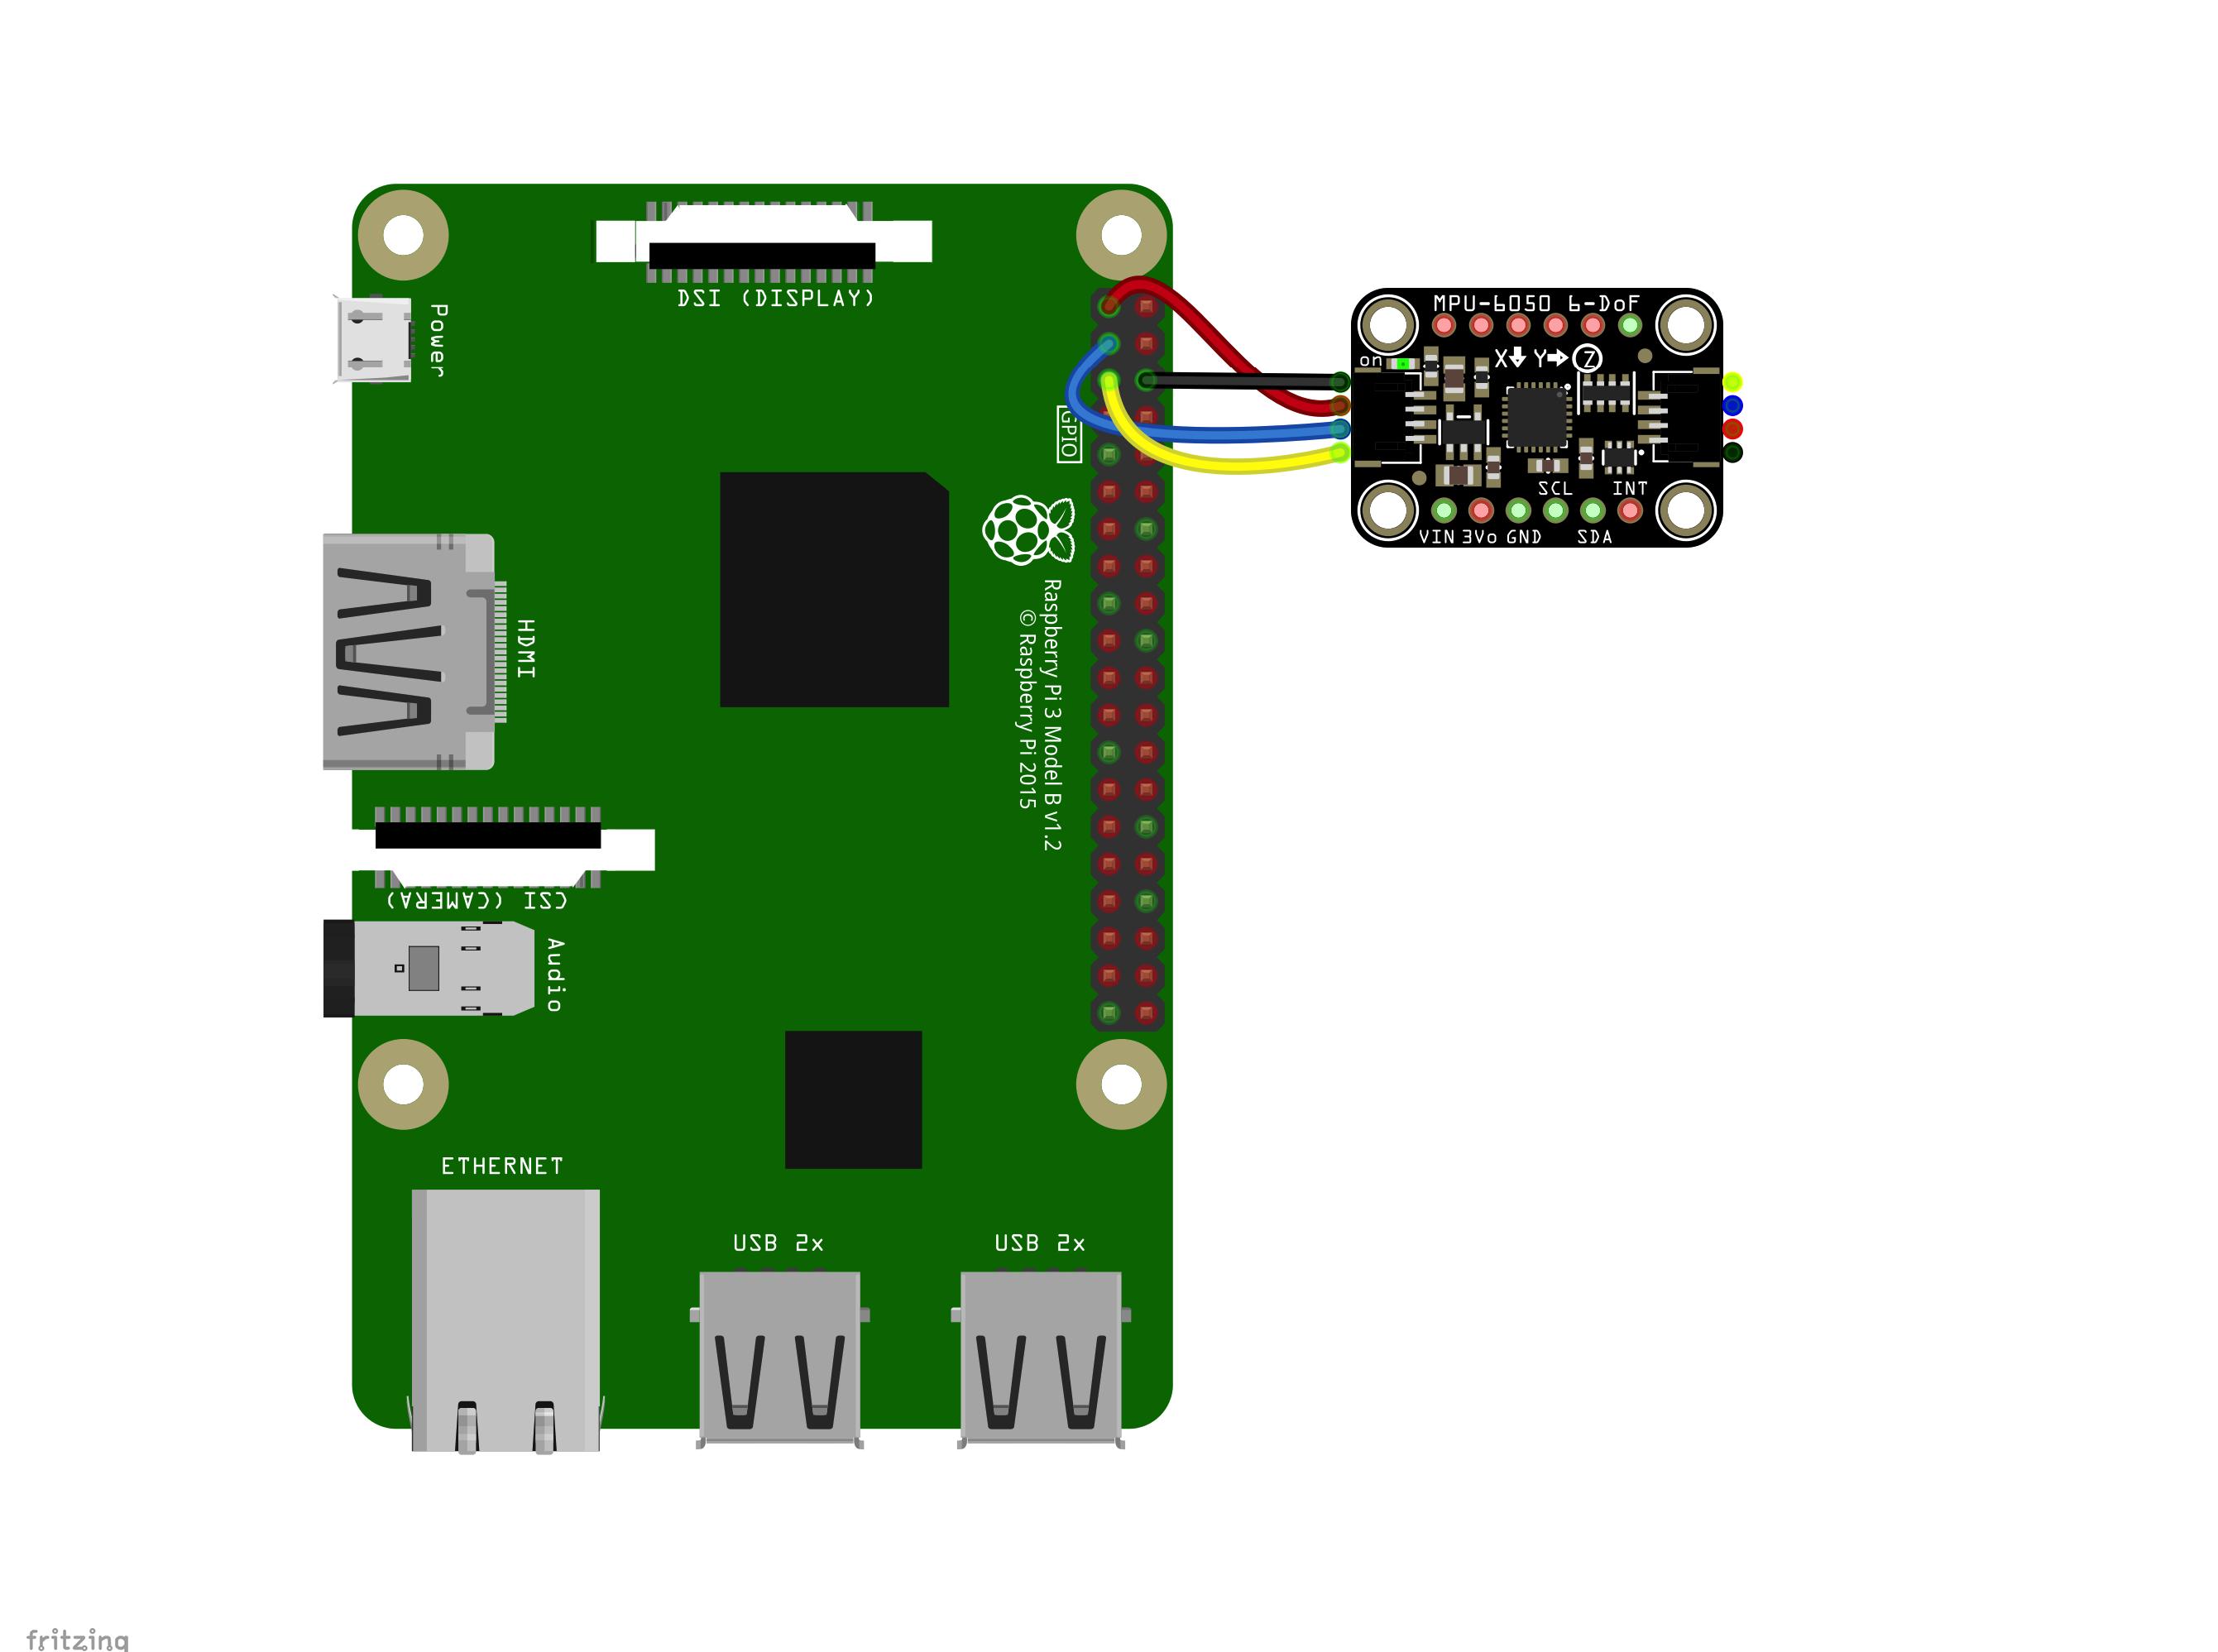 sensors_cpy_rpi_QT_wiring.png